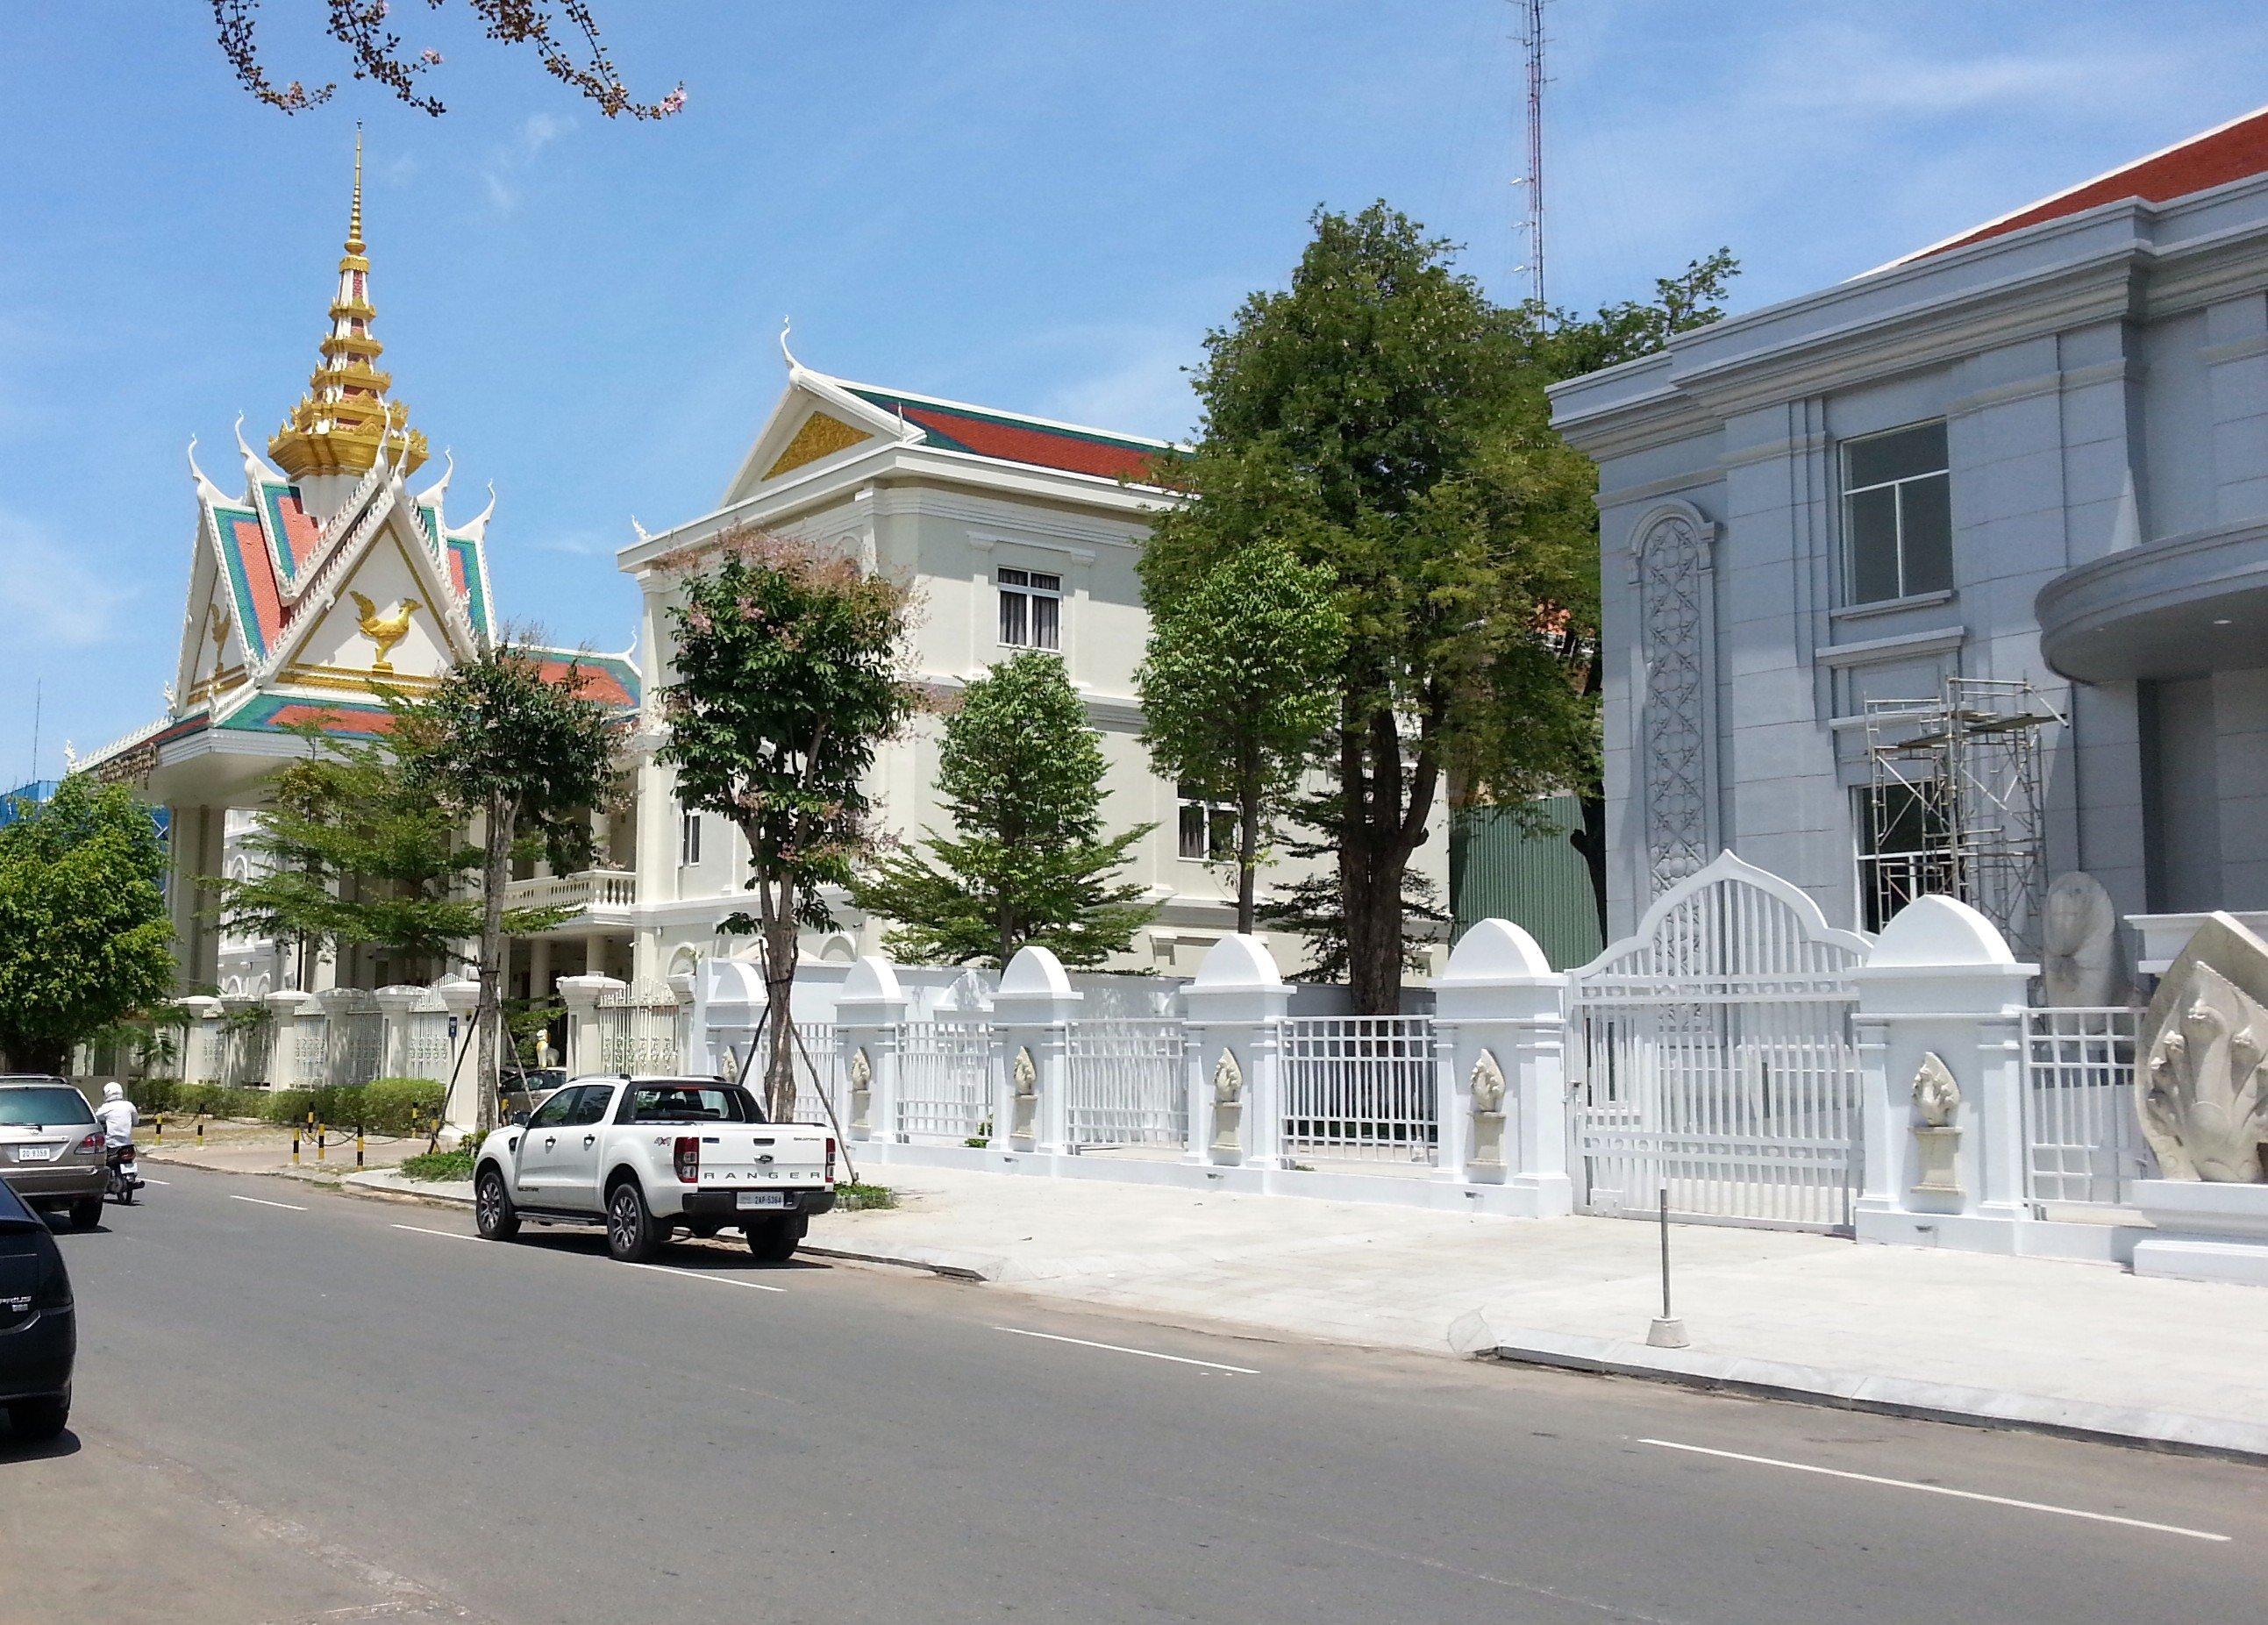 The Cambodia Securities Exchange is on Street 106